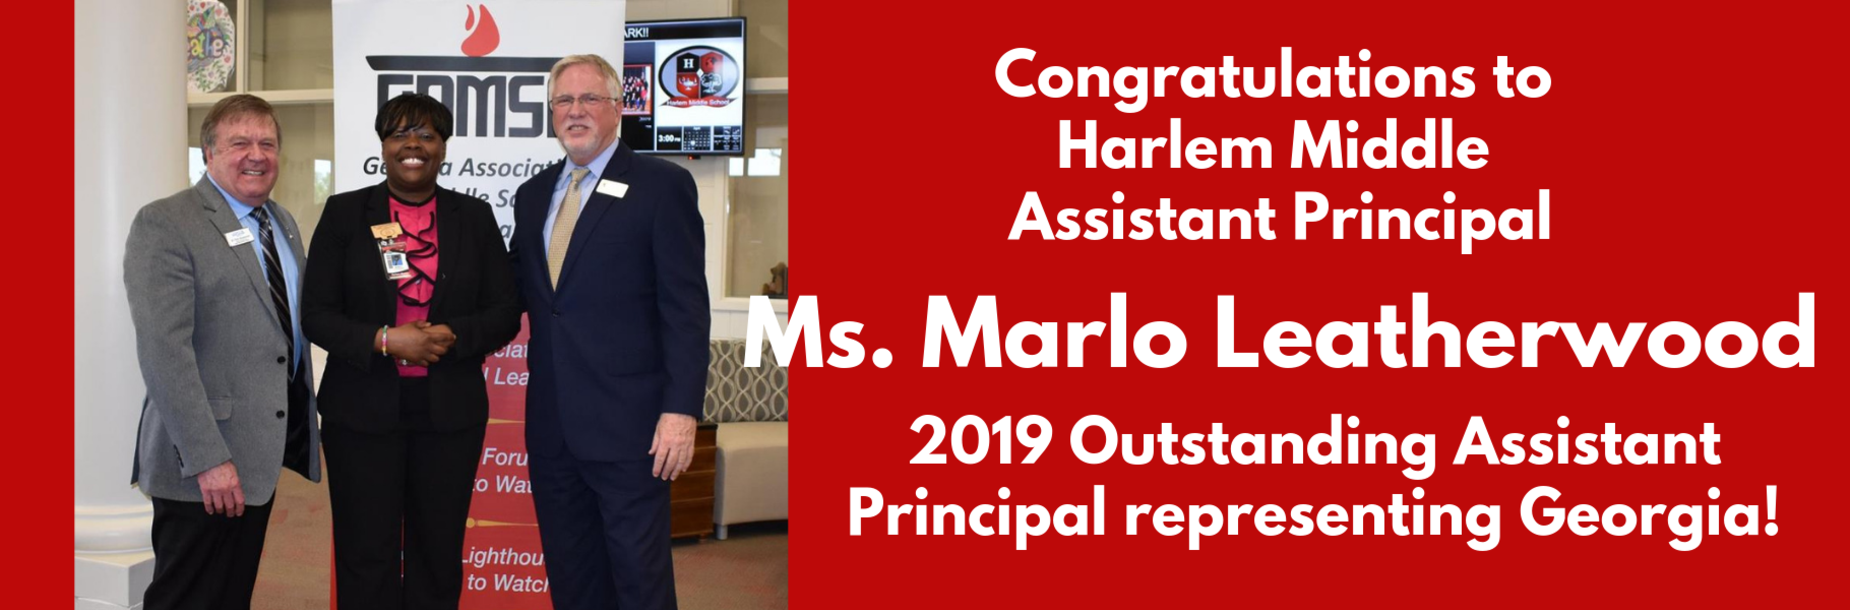 Marlo Leatherwood wins Outstanding Assistant Principal